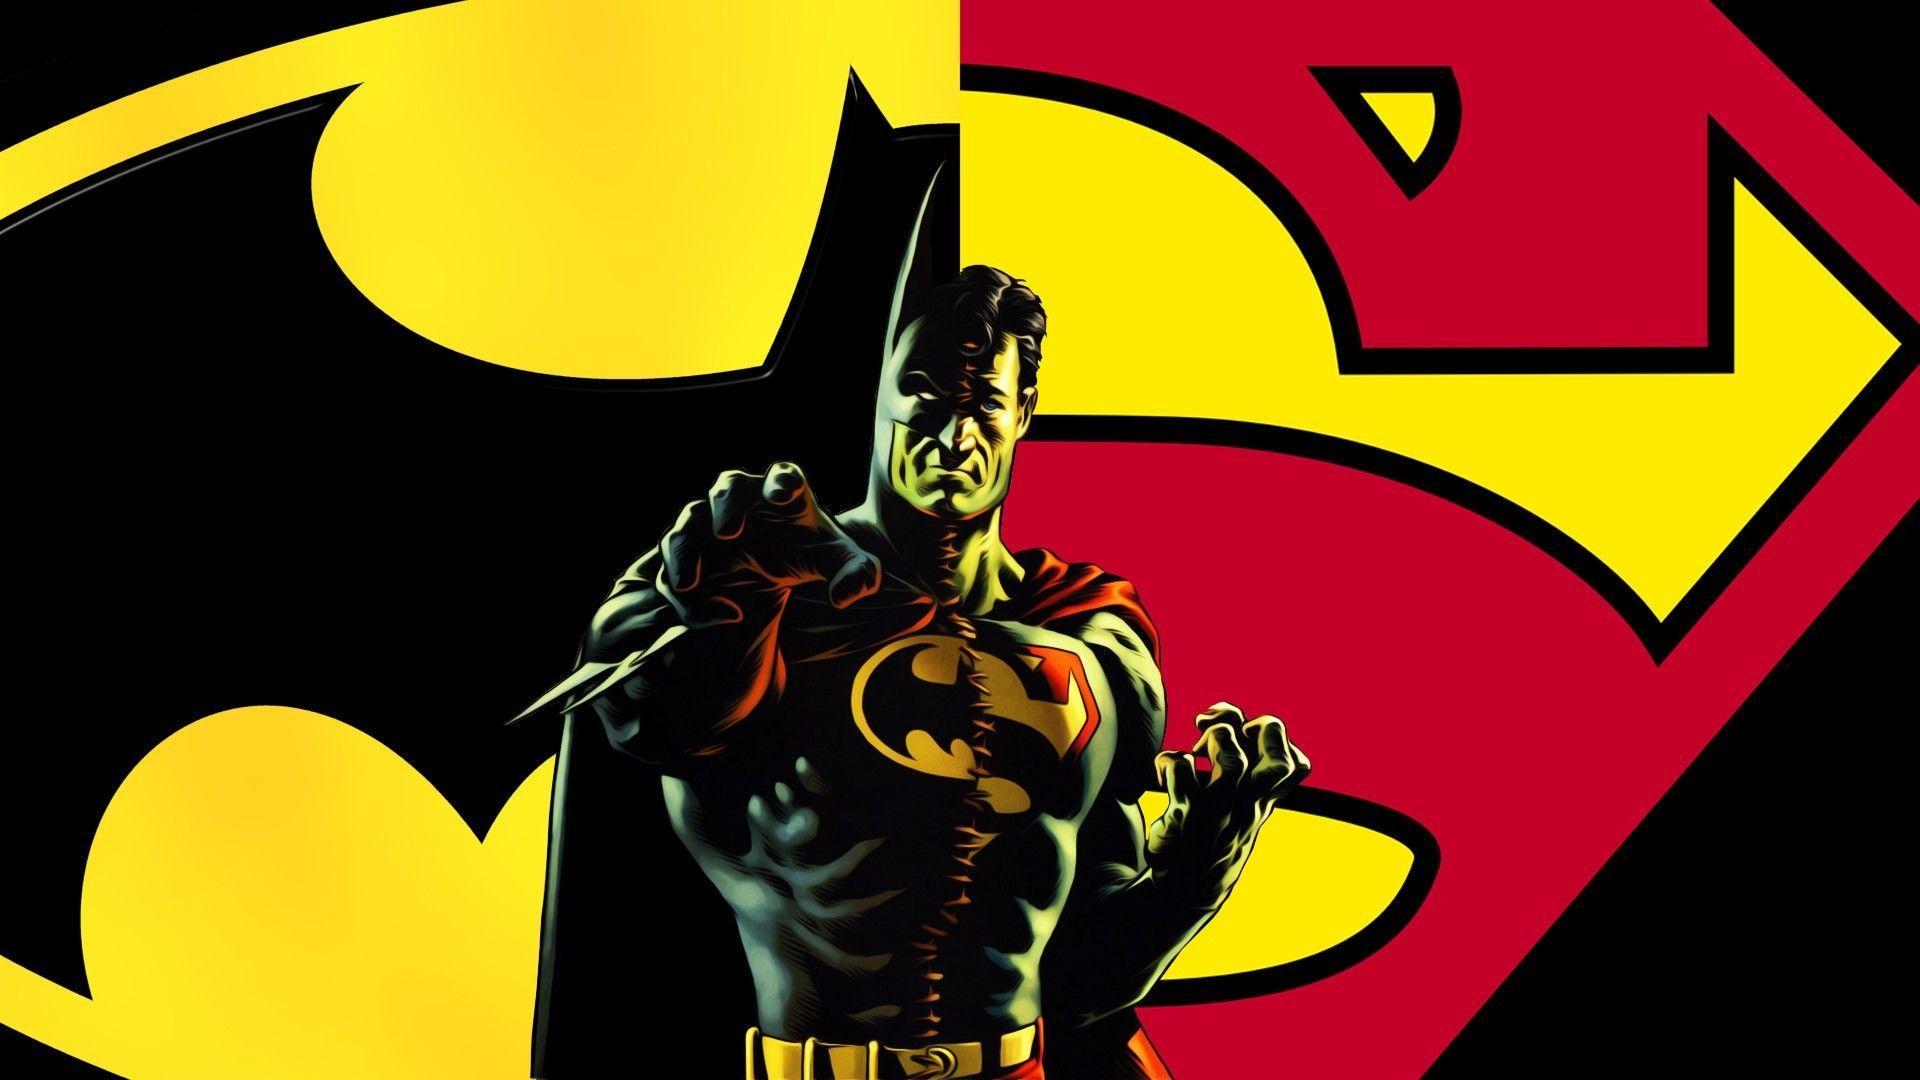 Superman And Batman Logo Wallpapers - Wallpaper Cave |Batman Superman Logo Wallpaper